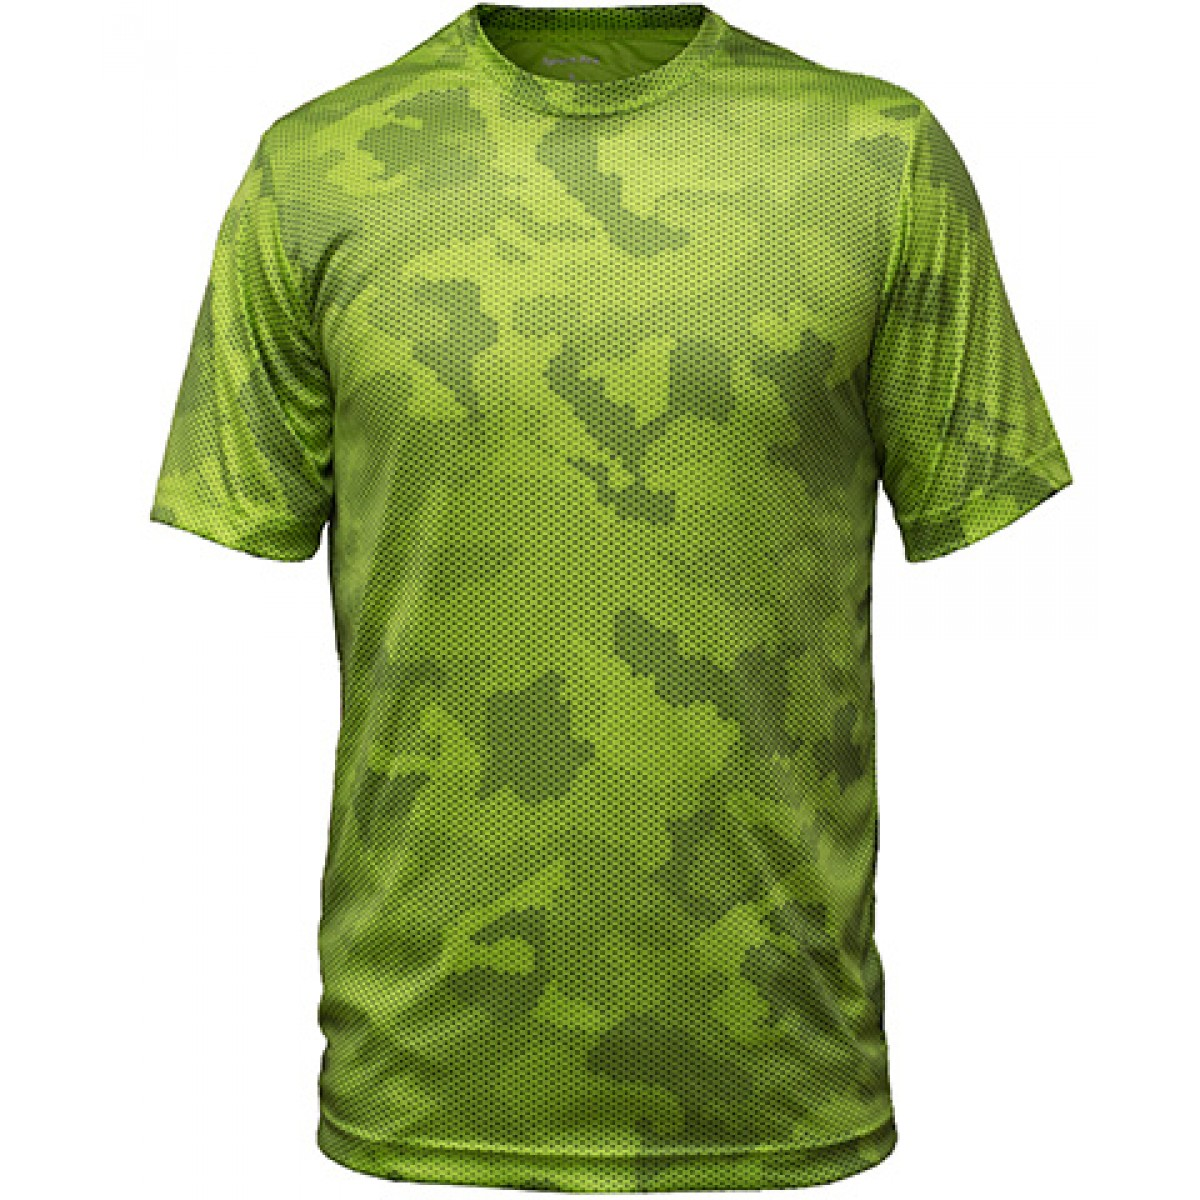 Sport-Tek CamoHex Tee-Green-M